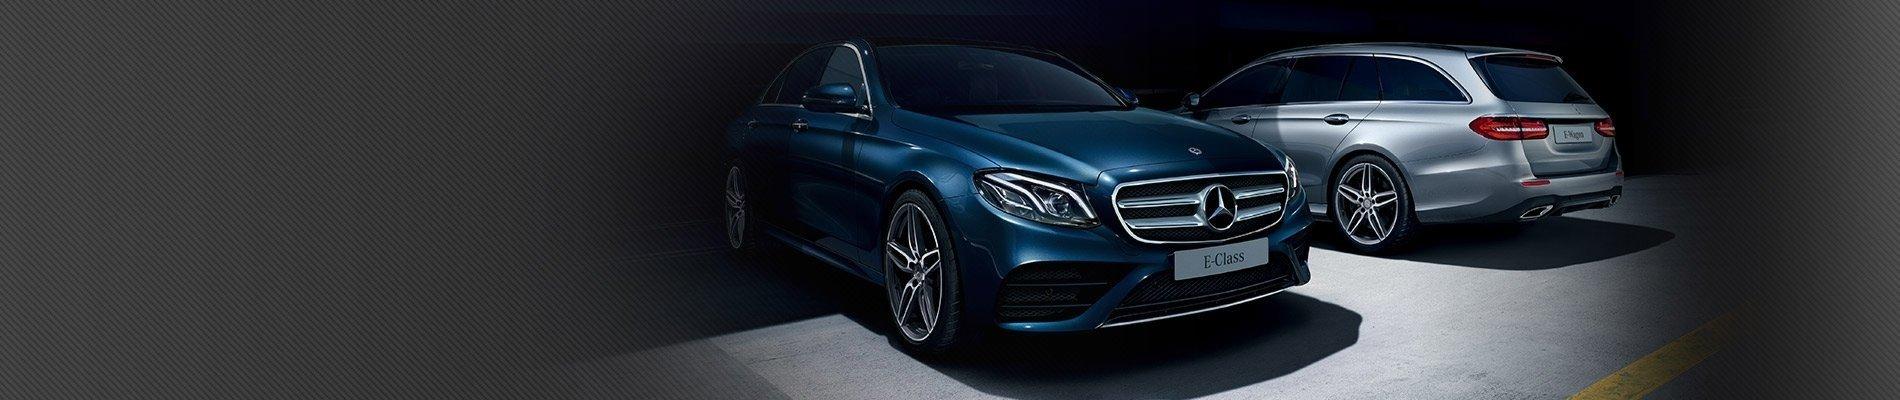 Corporate fleet mercedes benz maple for Mercedes benz maple service